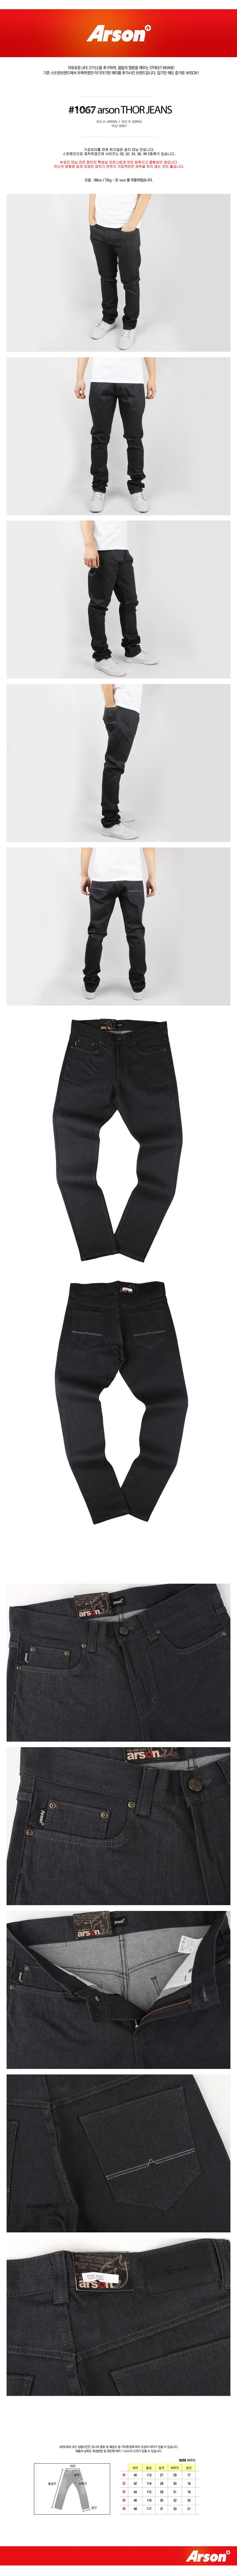 [ ARSON ] [Arson] ARSON GENUINE/1067 THOR JEANS (GREY)/men\'s jeans/jeans/ARSON jeans